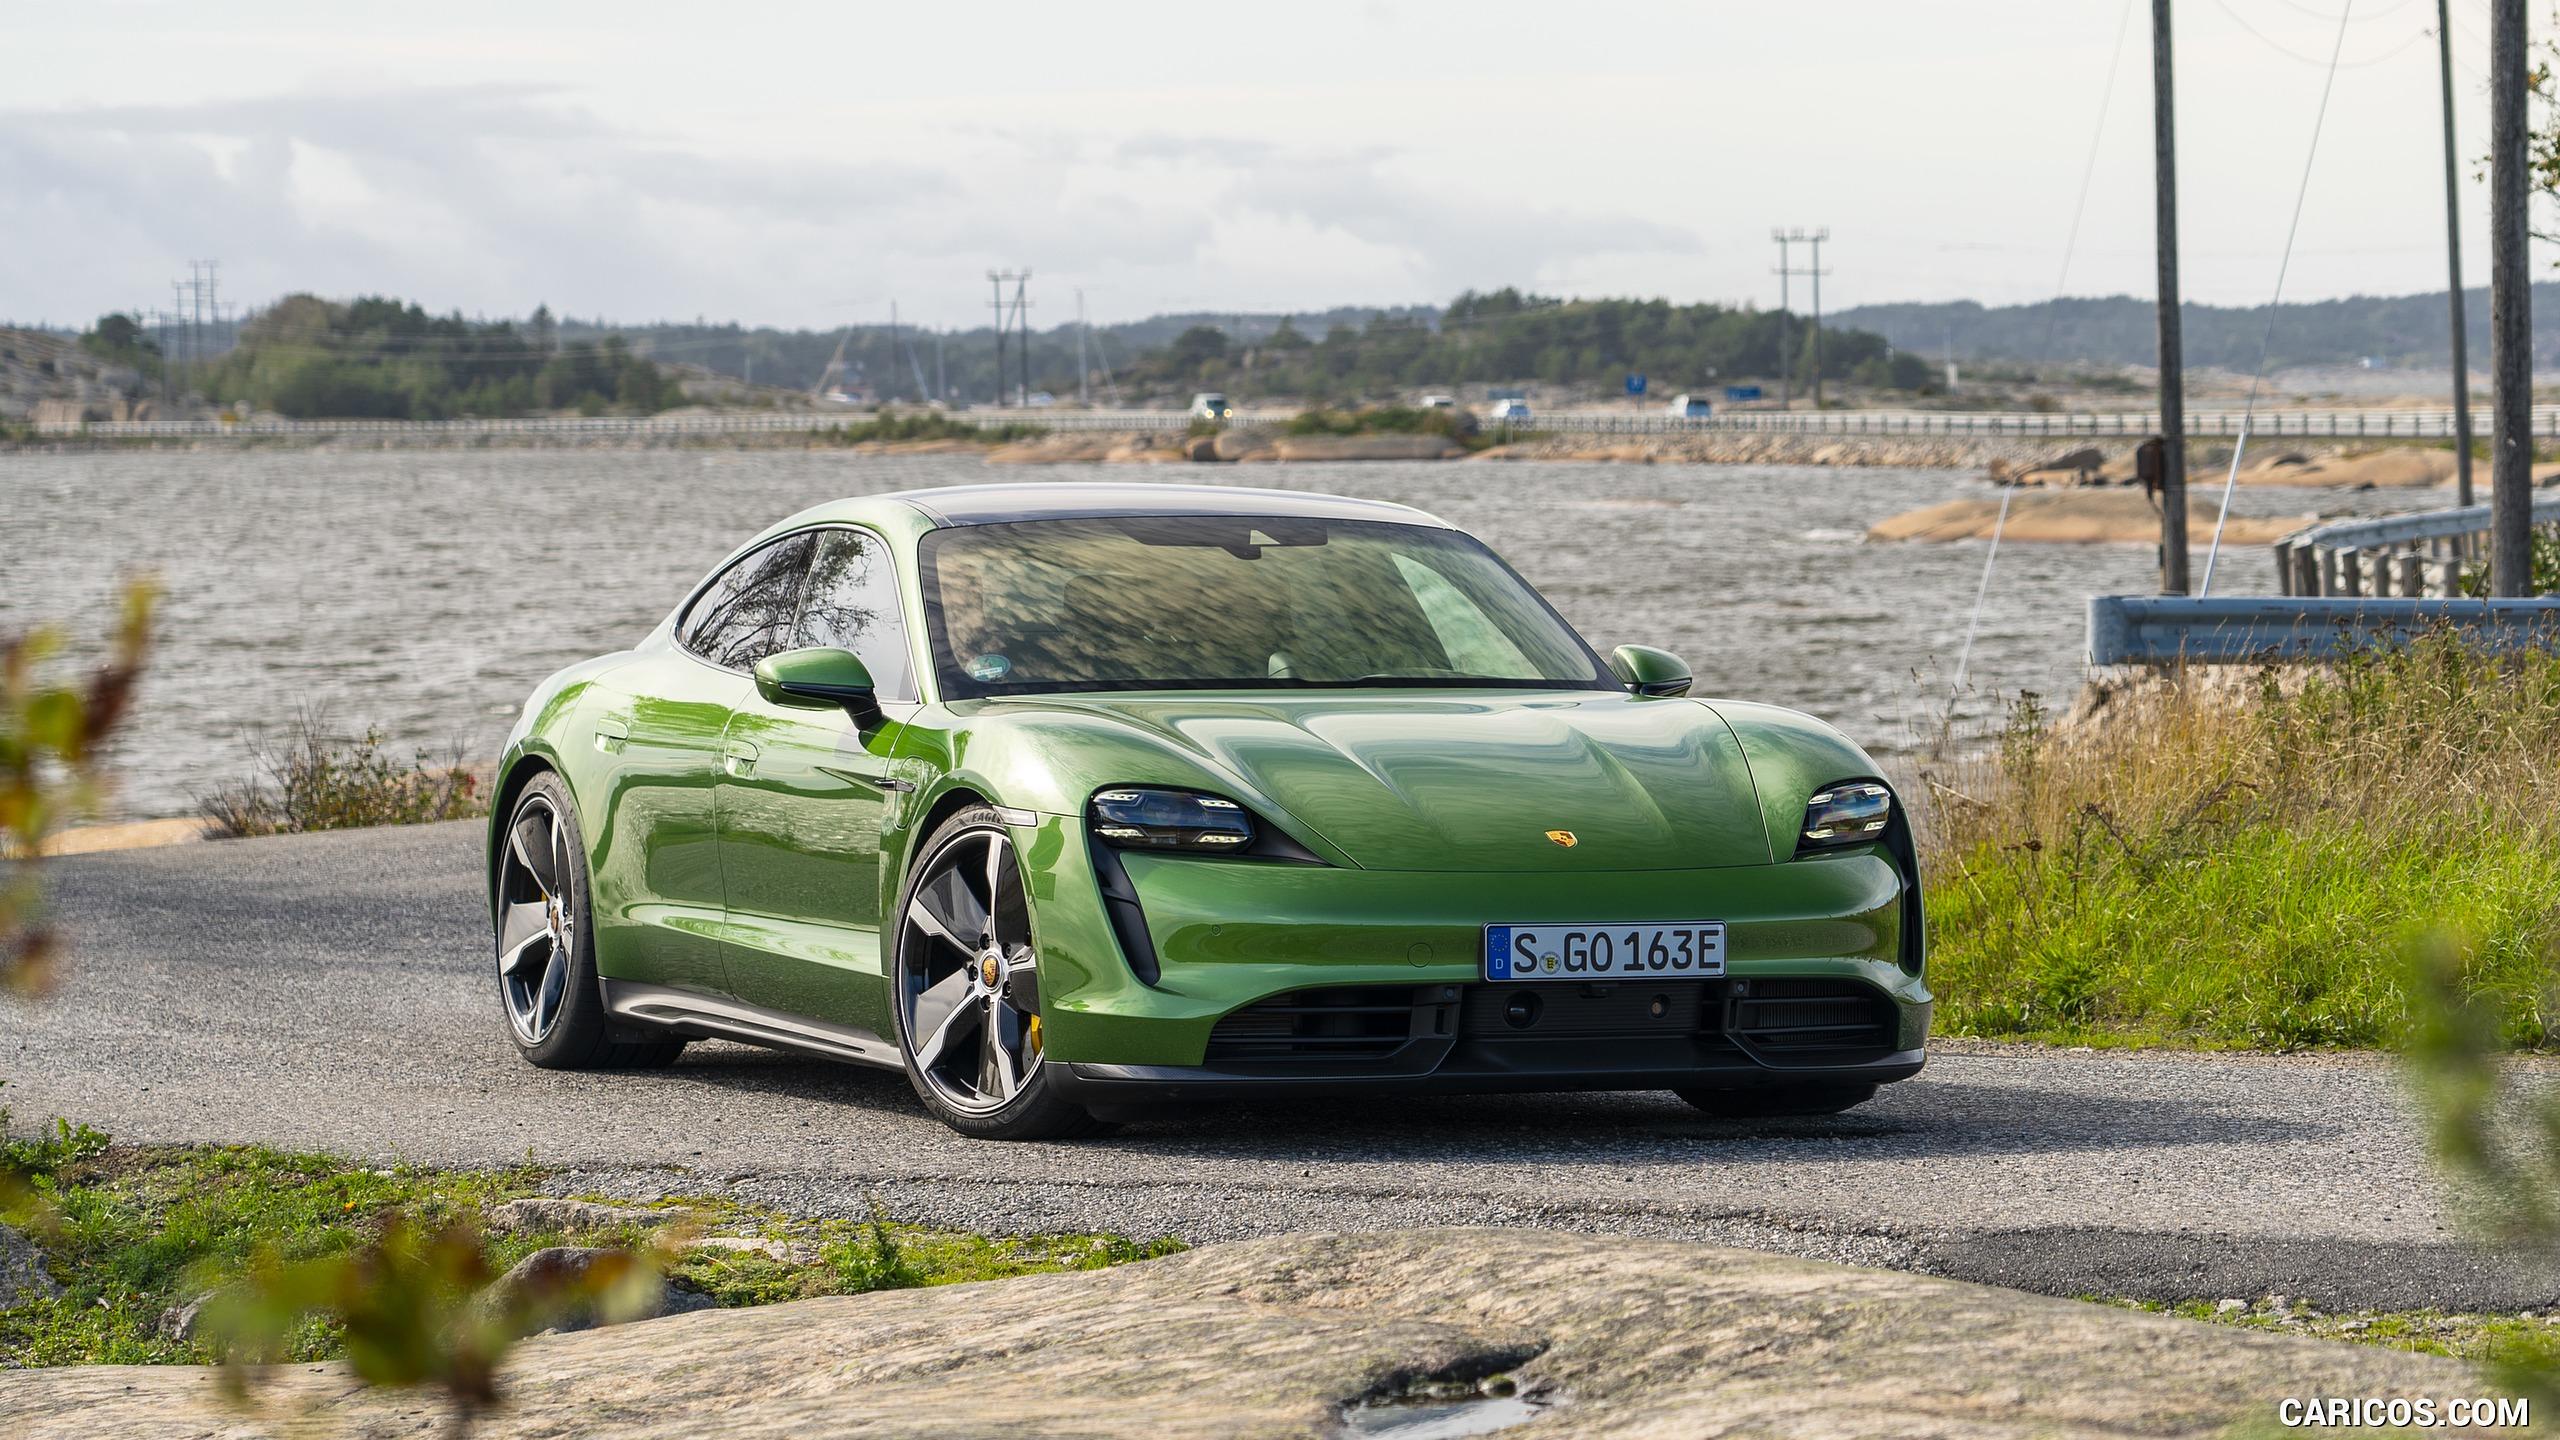 2020 Porsche Taycan Turbo S Color Mamba Green Metallic   Front 2560x1440